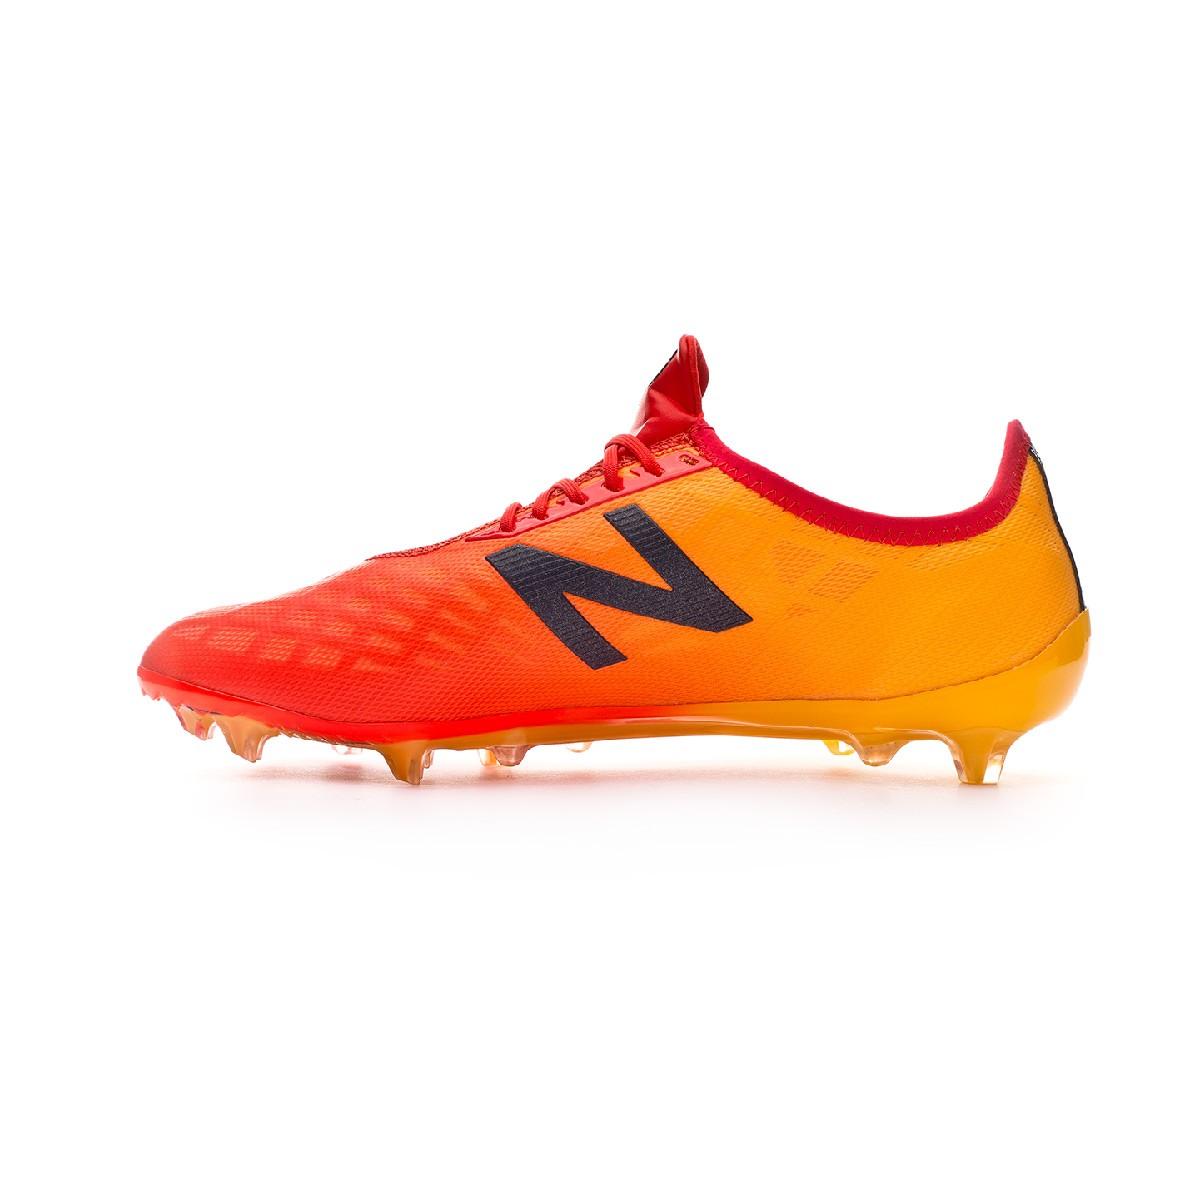 pretty nice 1ecac 51dde Chaussure de foot New Balance Furon 4.0 Pro FG Flame - Boutique de football  Fútbol Emotion